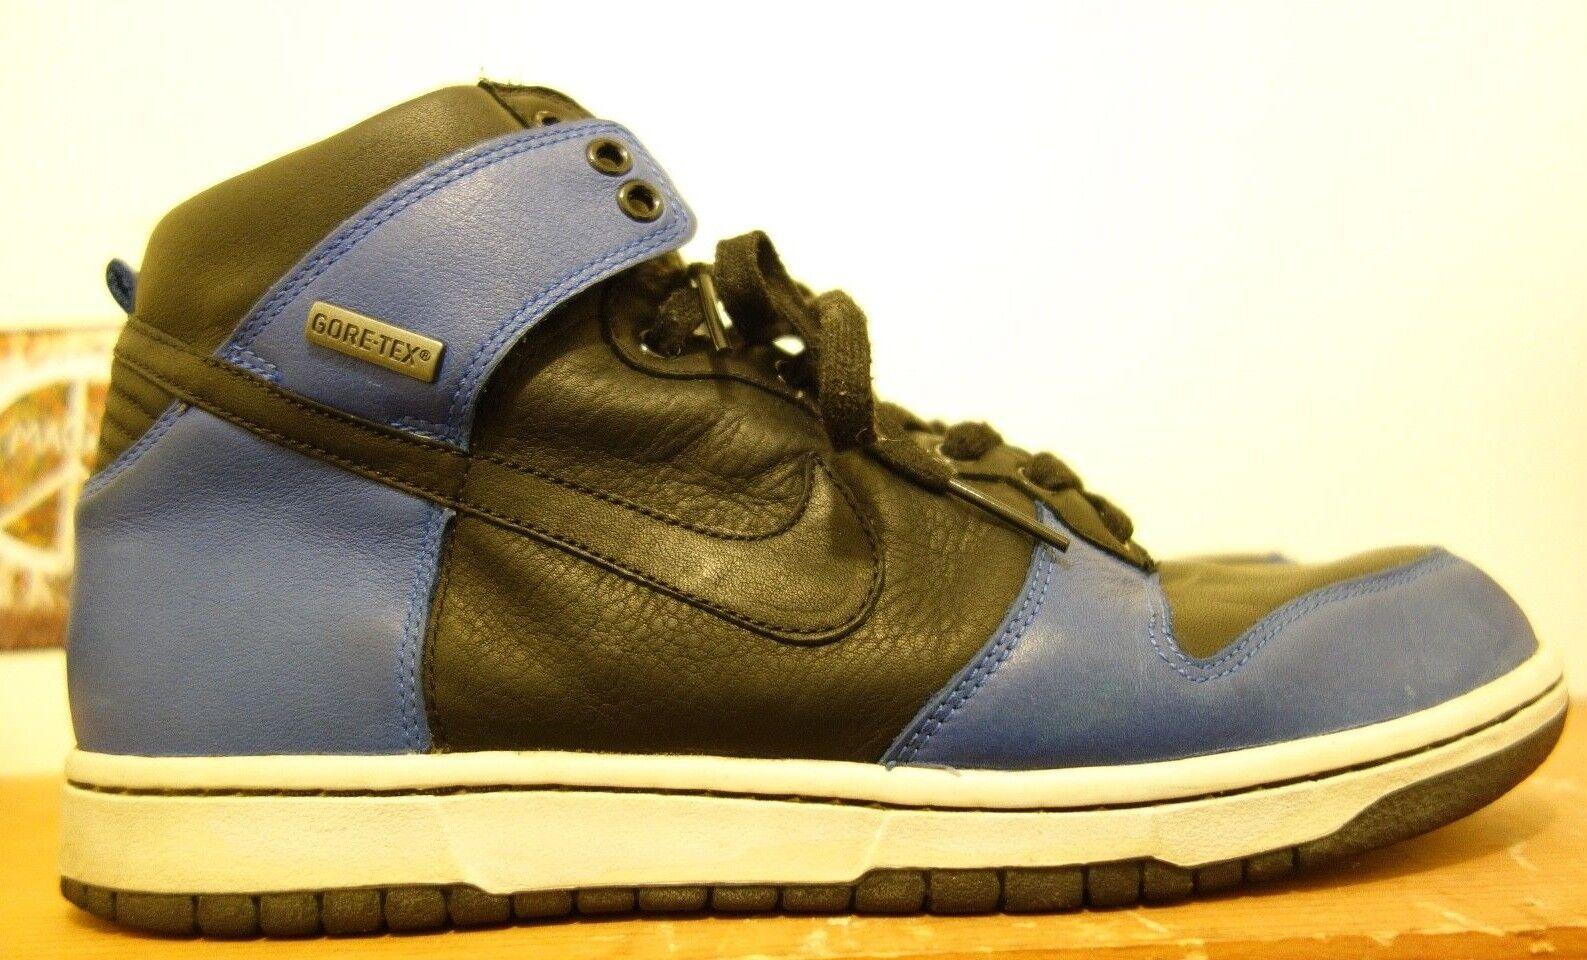 Nike Dunk High Premium GTX Hommes 10.5 Royal 2007 Bleu Jordan Gore tex 2007 Royal RARE 7de2c2